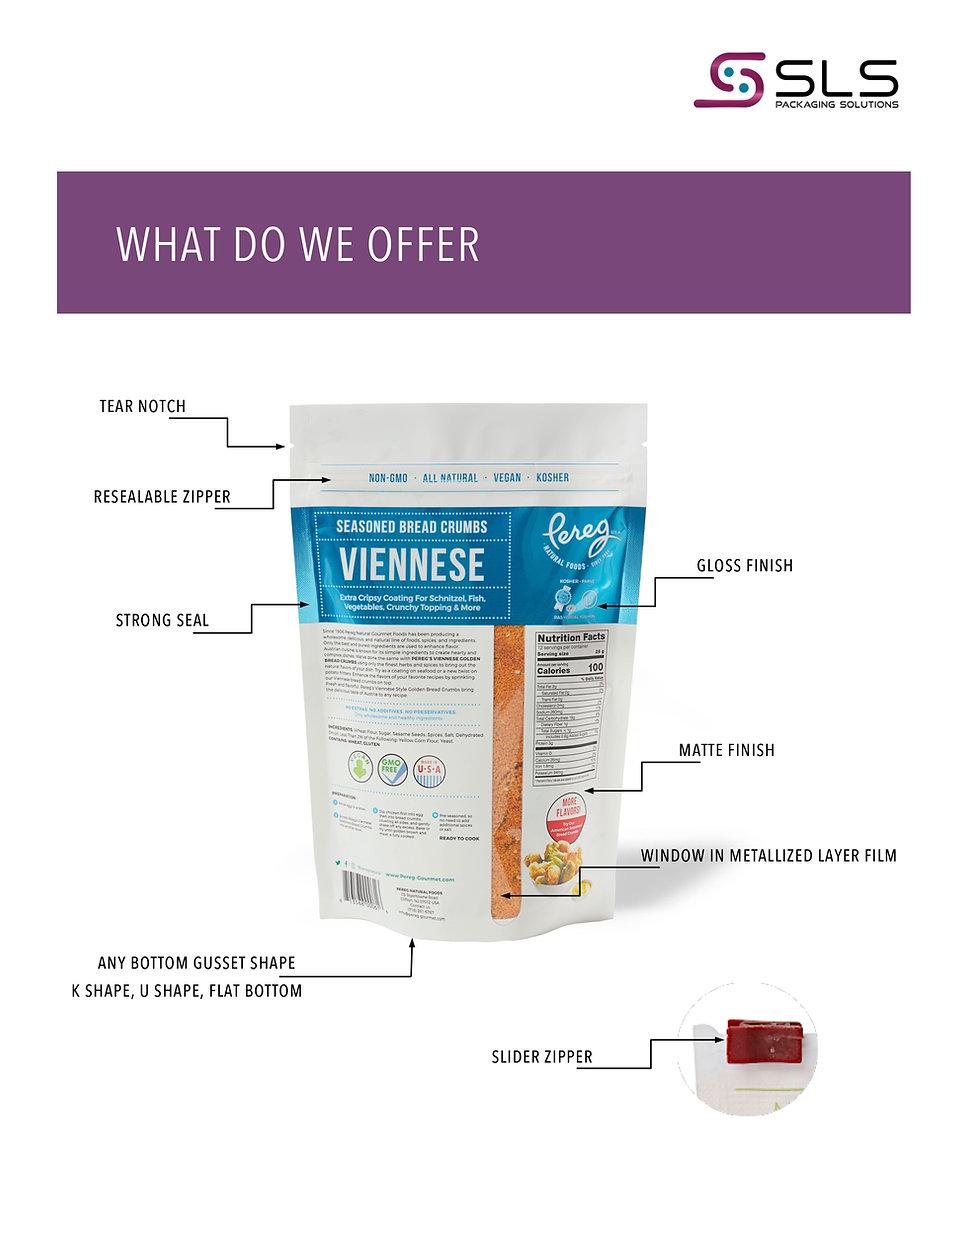 SLS-Packaging-Solutions-brochure-final-5